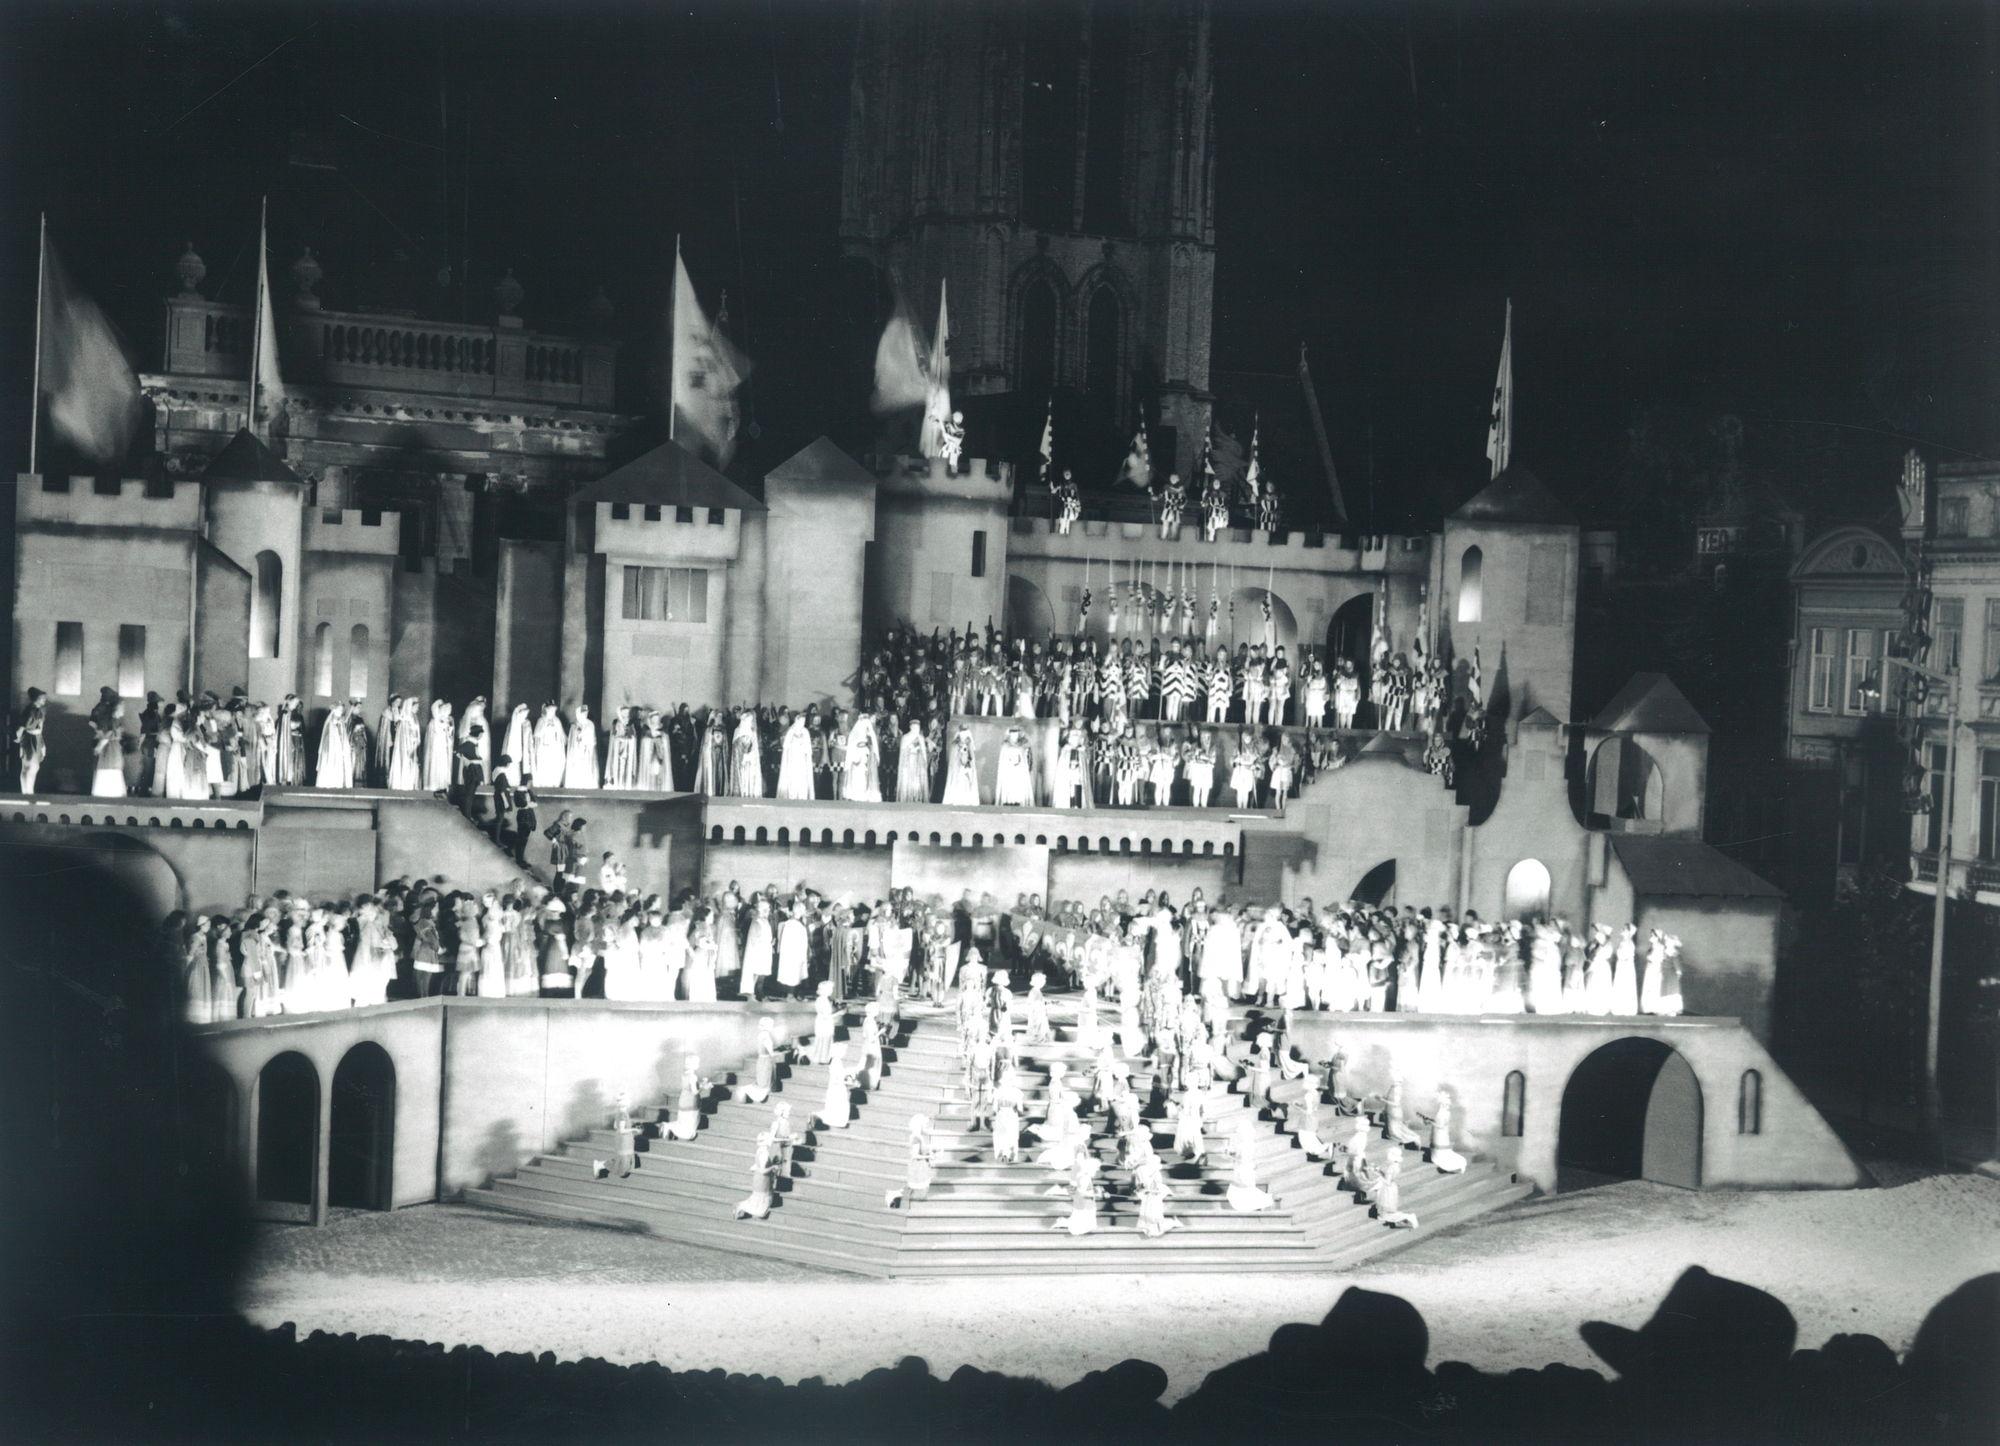 Massaspel der Gulden Sporen 1952